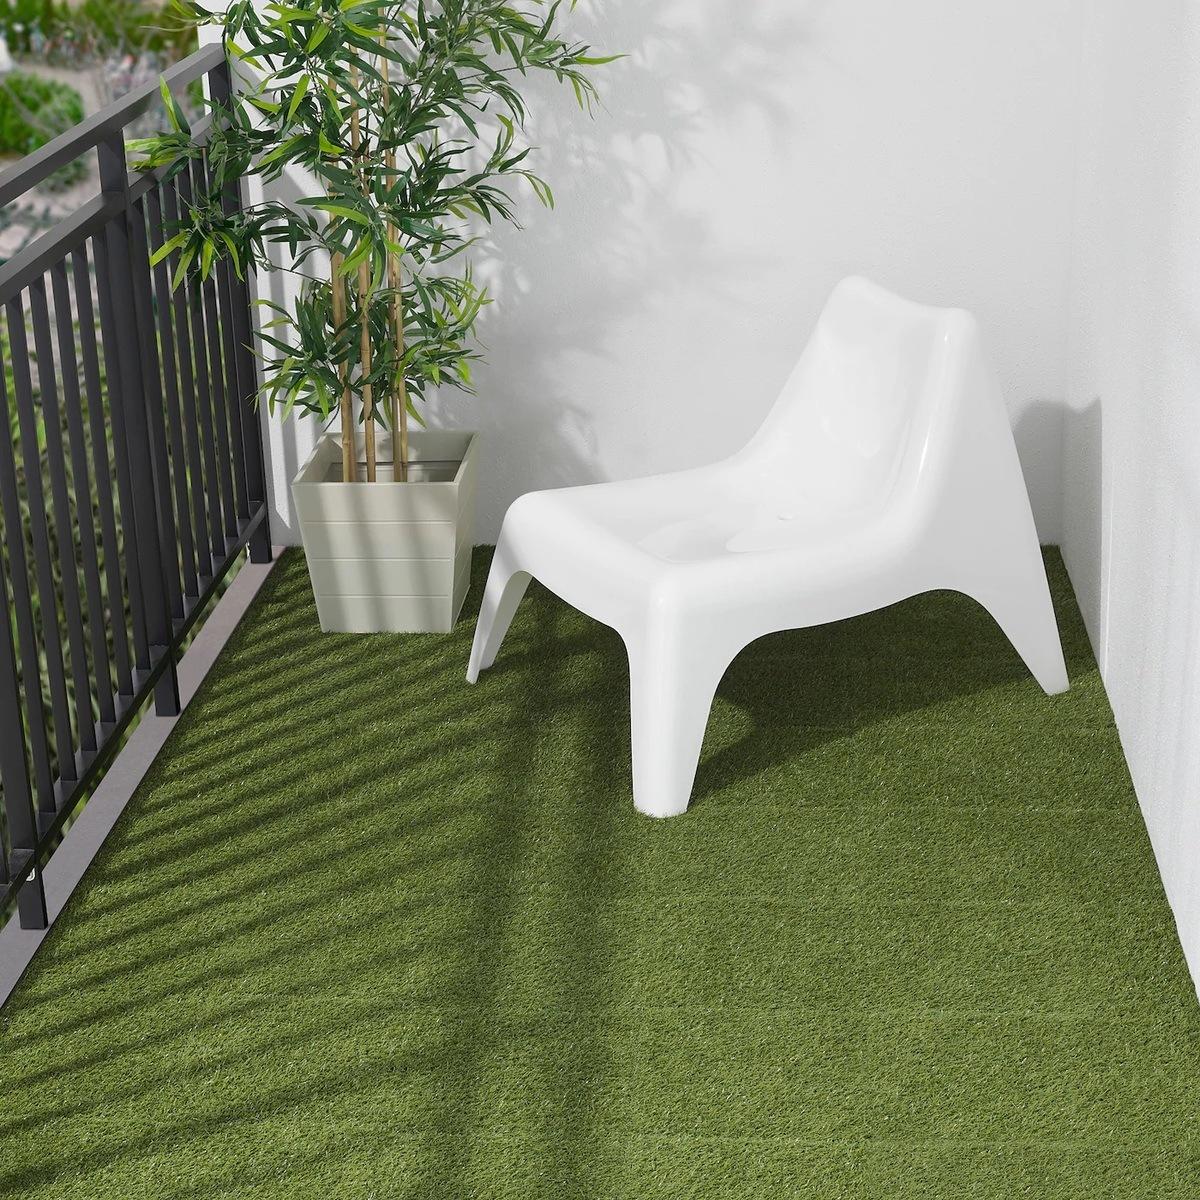 Catalogo parquet IKEA Enero 2021 FOTOS suelo madera runner estilo cesped